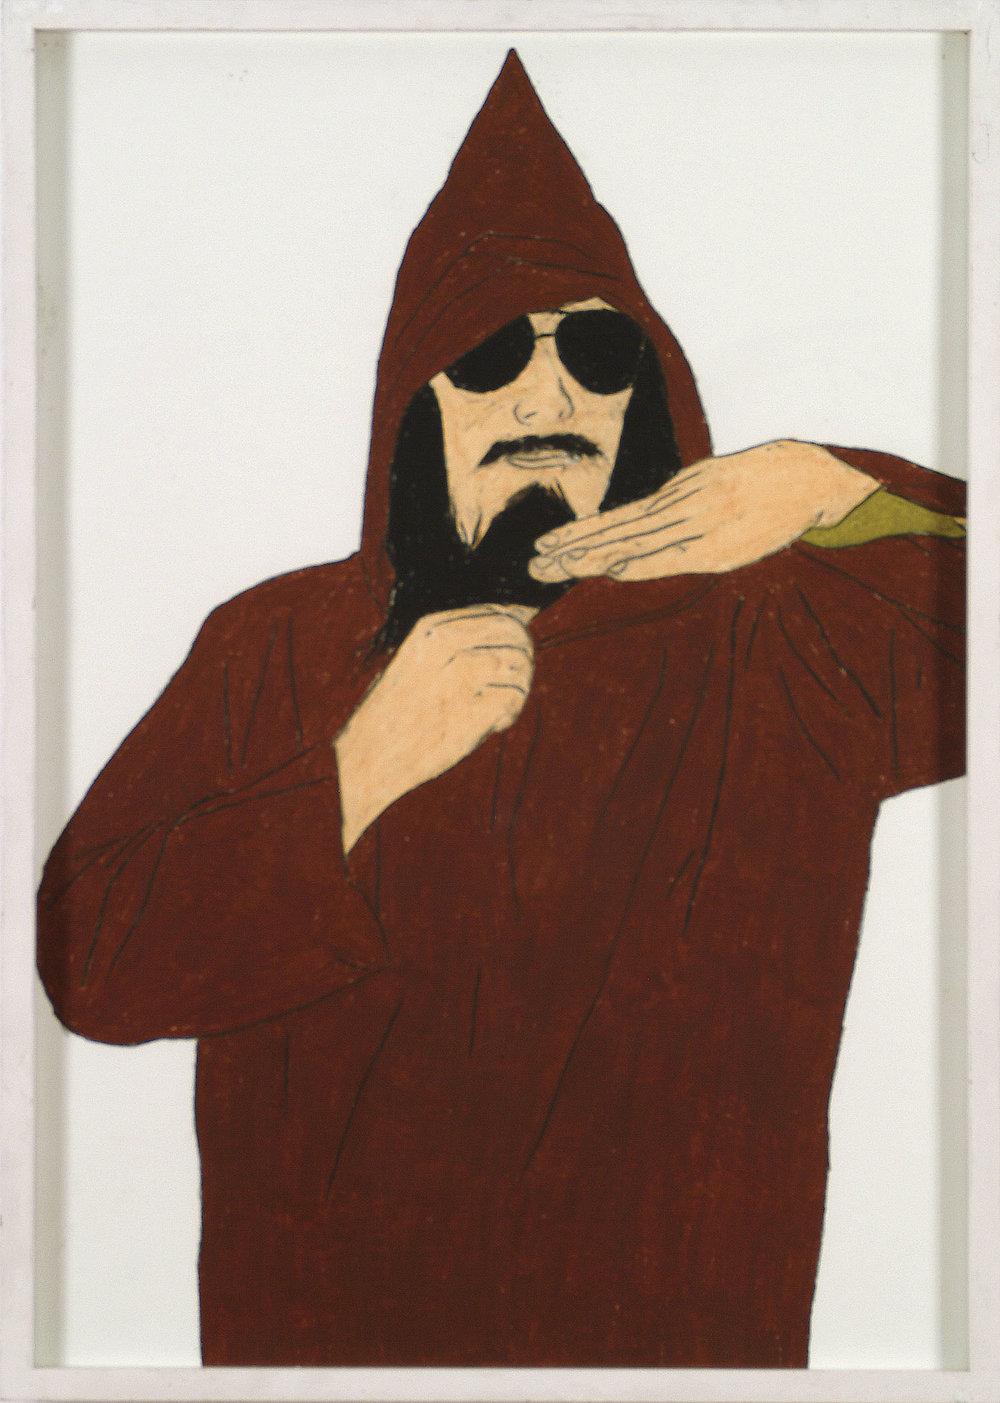 J. Meese | Wachskreide auf Karton | 2008 | 84 x 59 cm